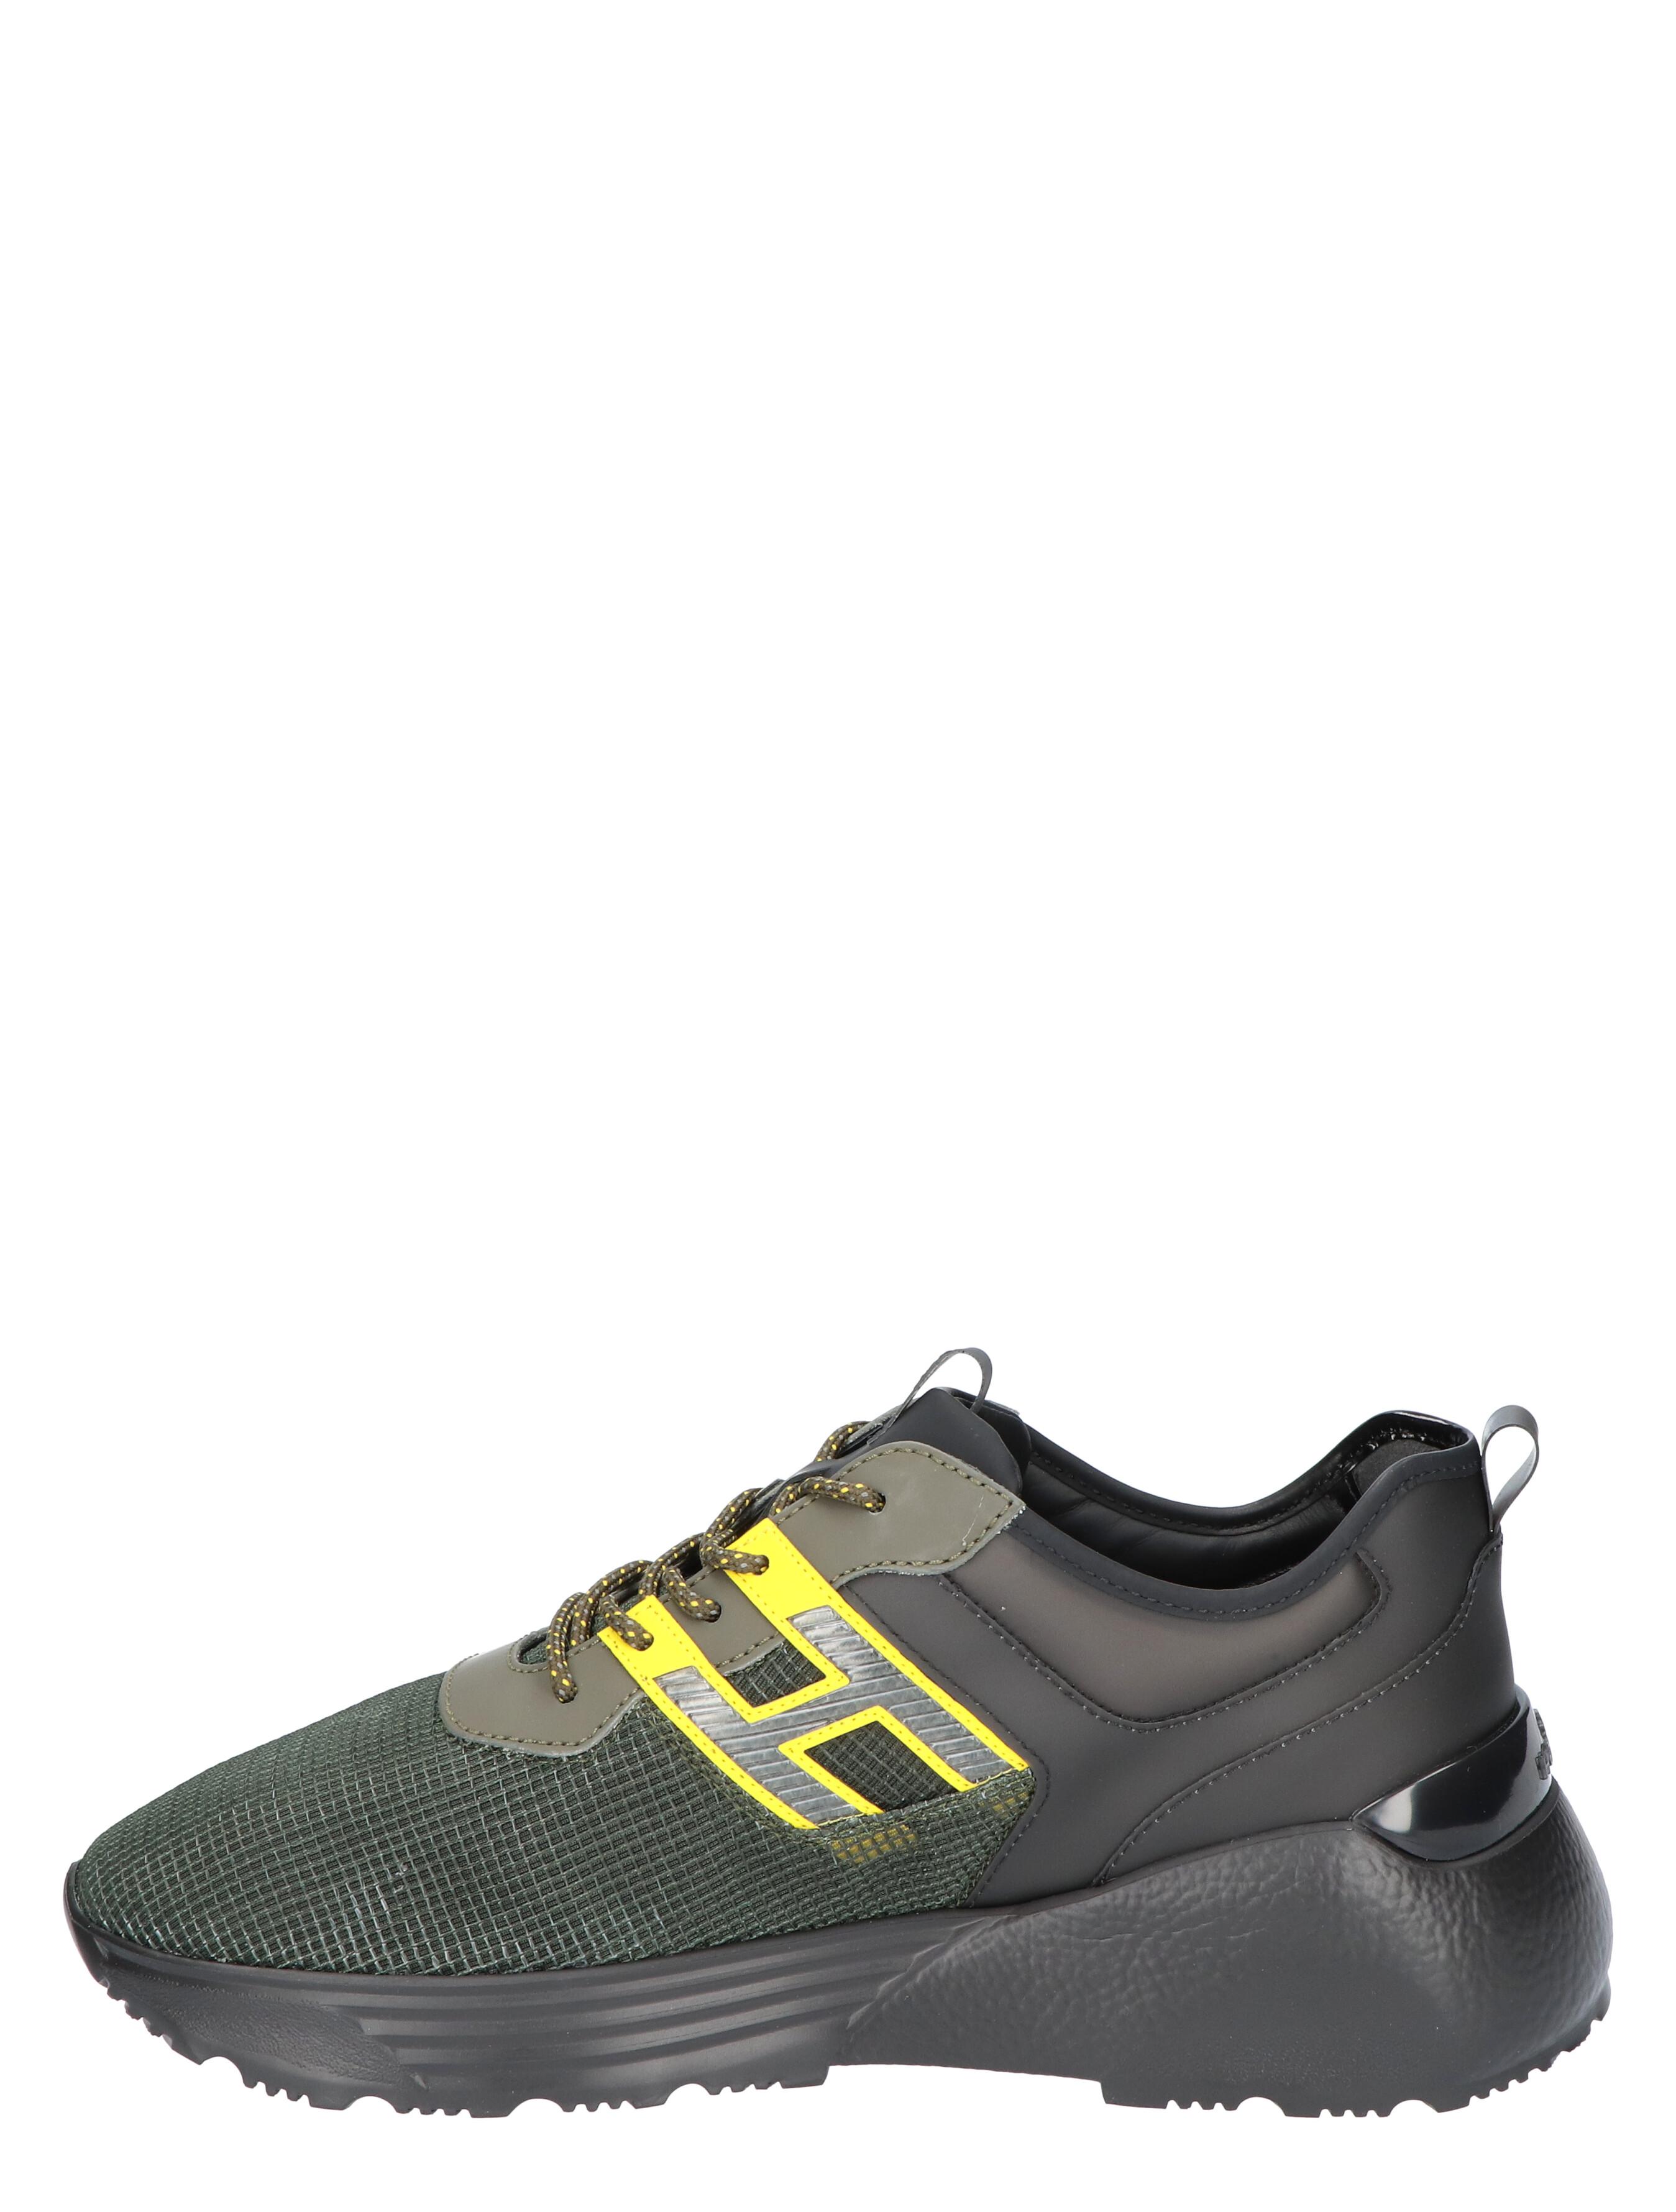 Hogan Active One Green Black Lage sneakers